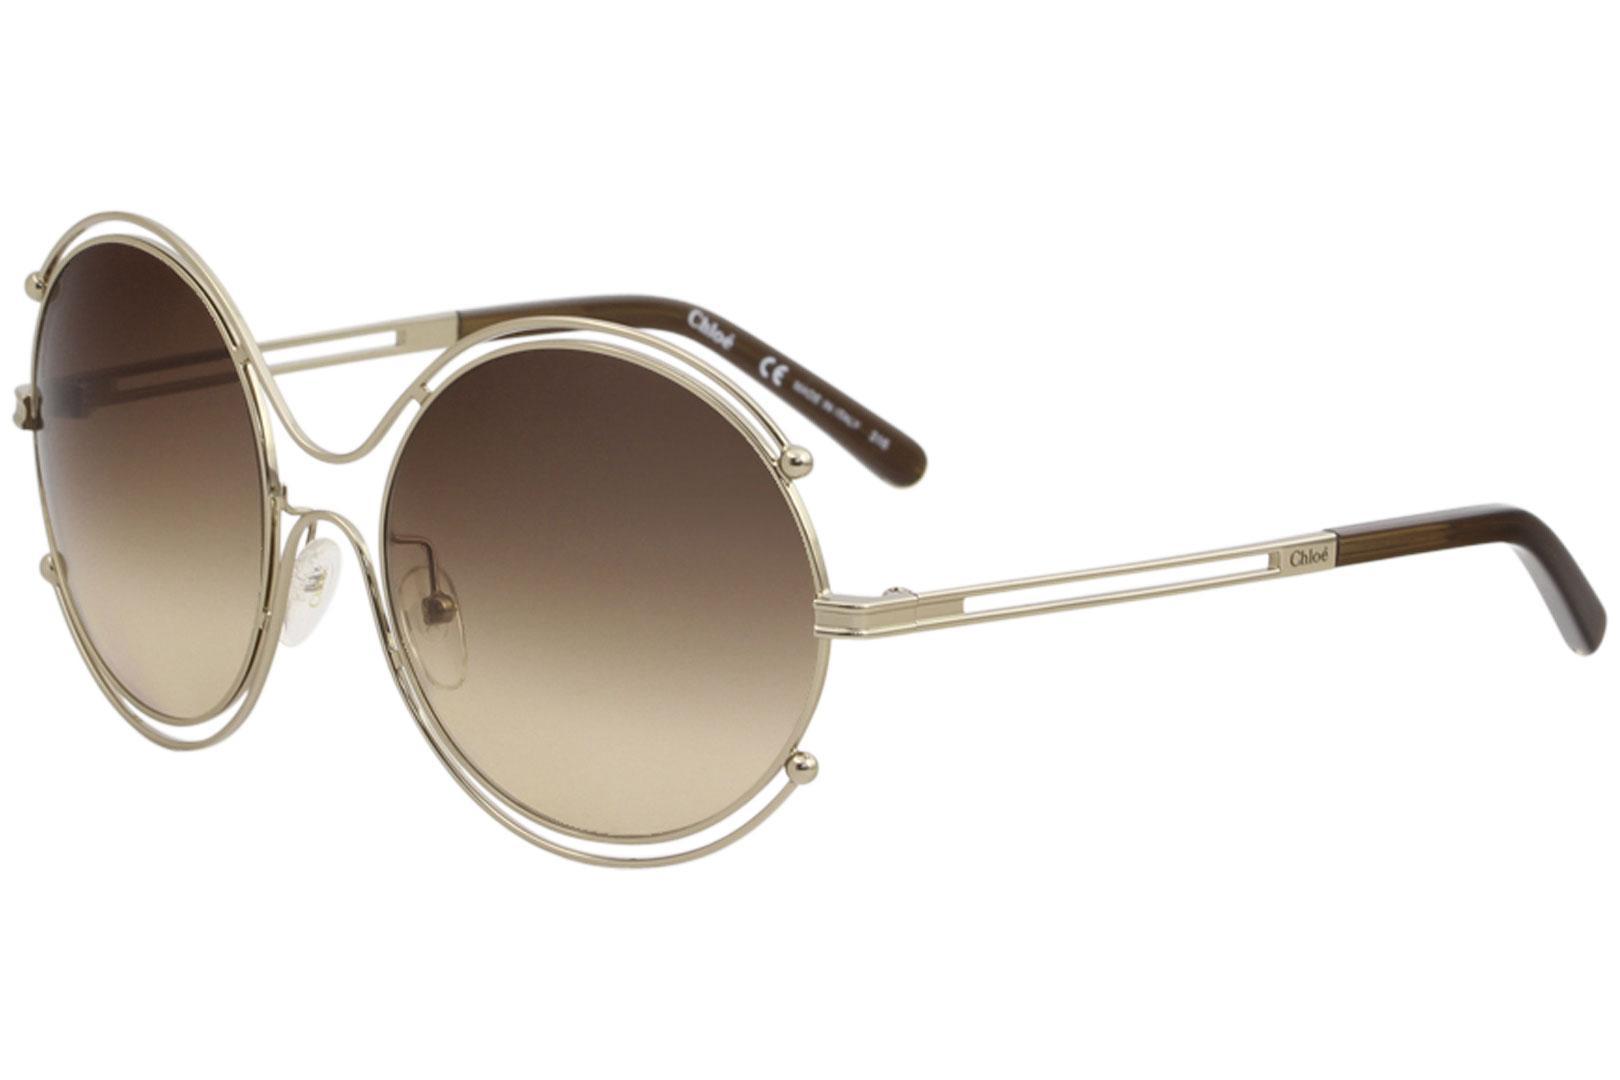 7f5f11bef9b Chloe Women s CE 122S CE122S 786 Rose Gold Fashion Round Sunglasses ...